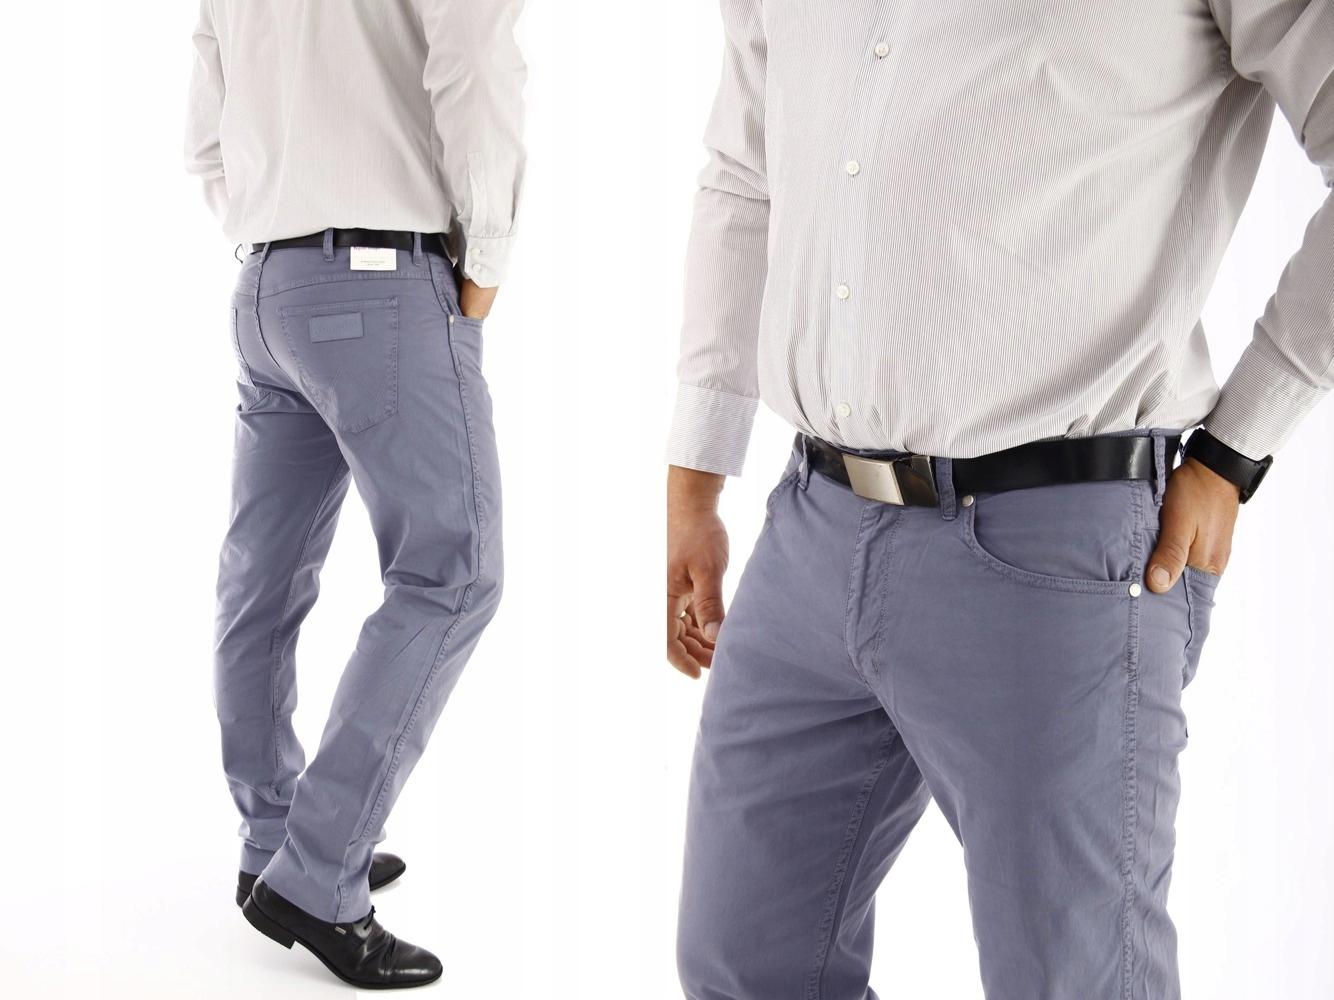 Wrangler Greensboro Flinston Blue spodnie W36 L32